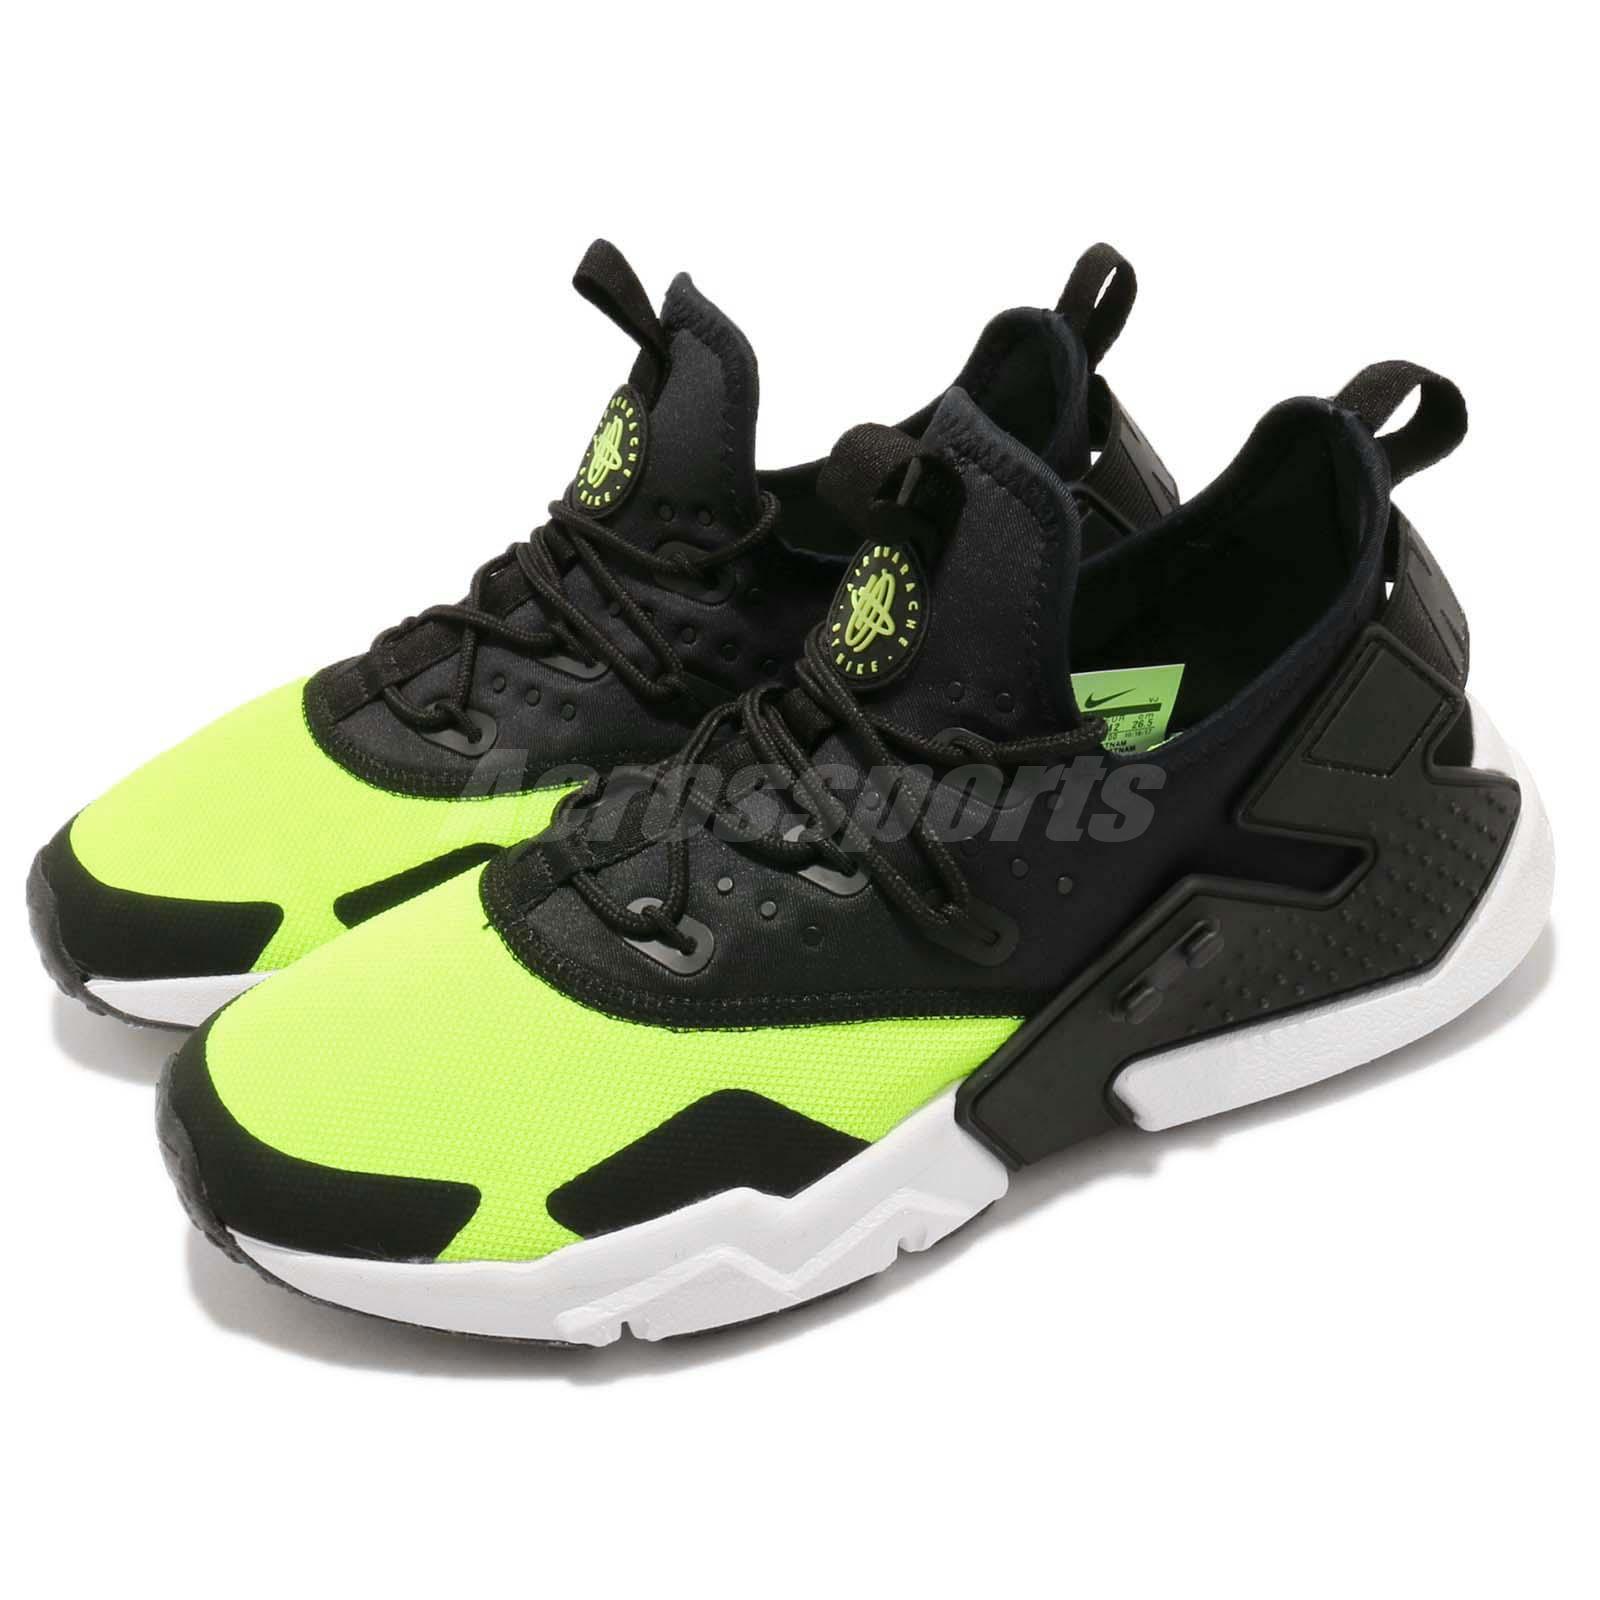 4ba5664cfb41 Details about Nike Air Huarache Drift Volt Black White Men Running Shoes  Sneakers AH7334-700